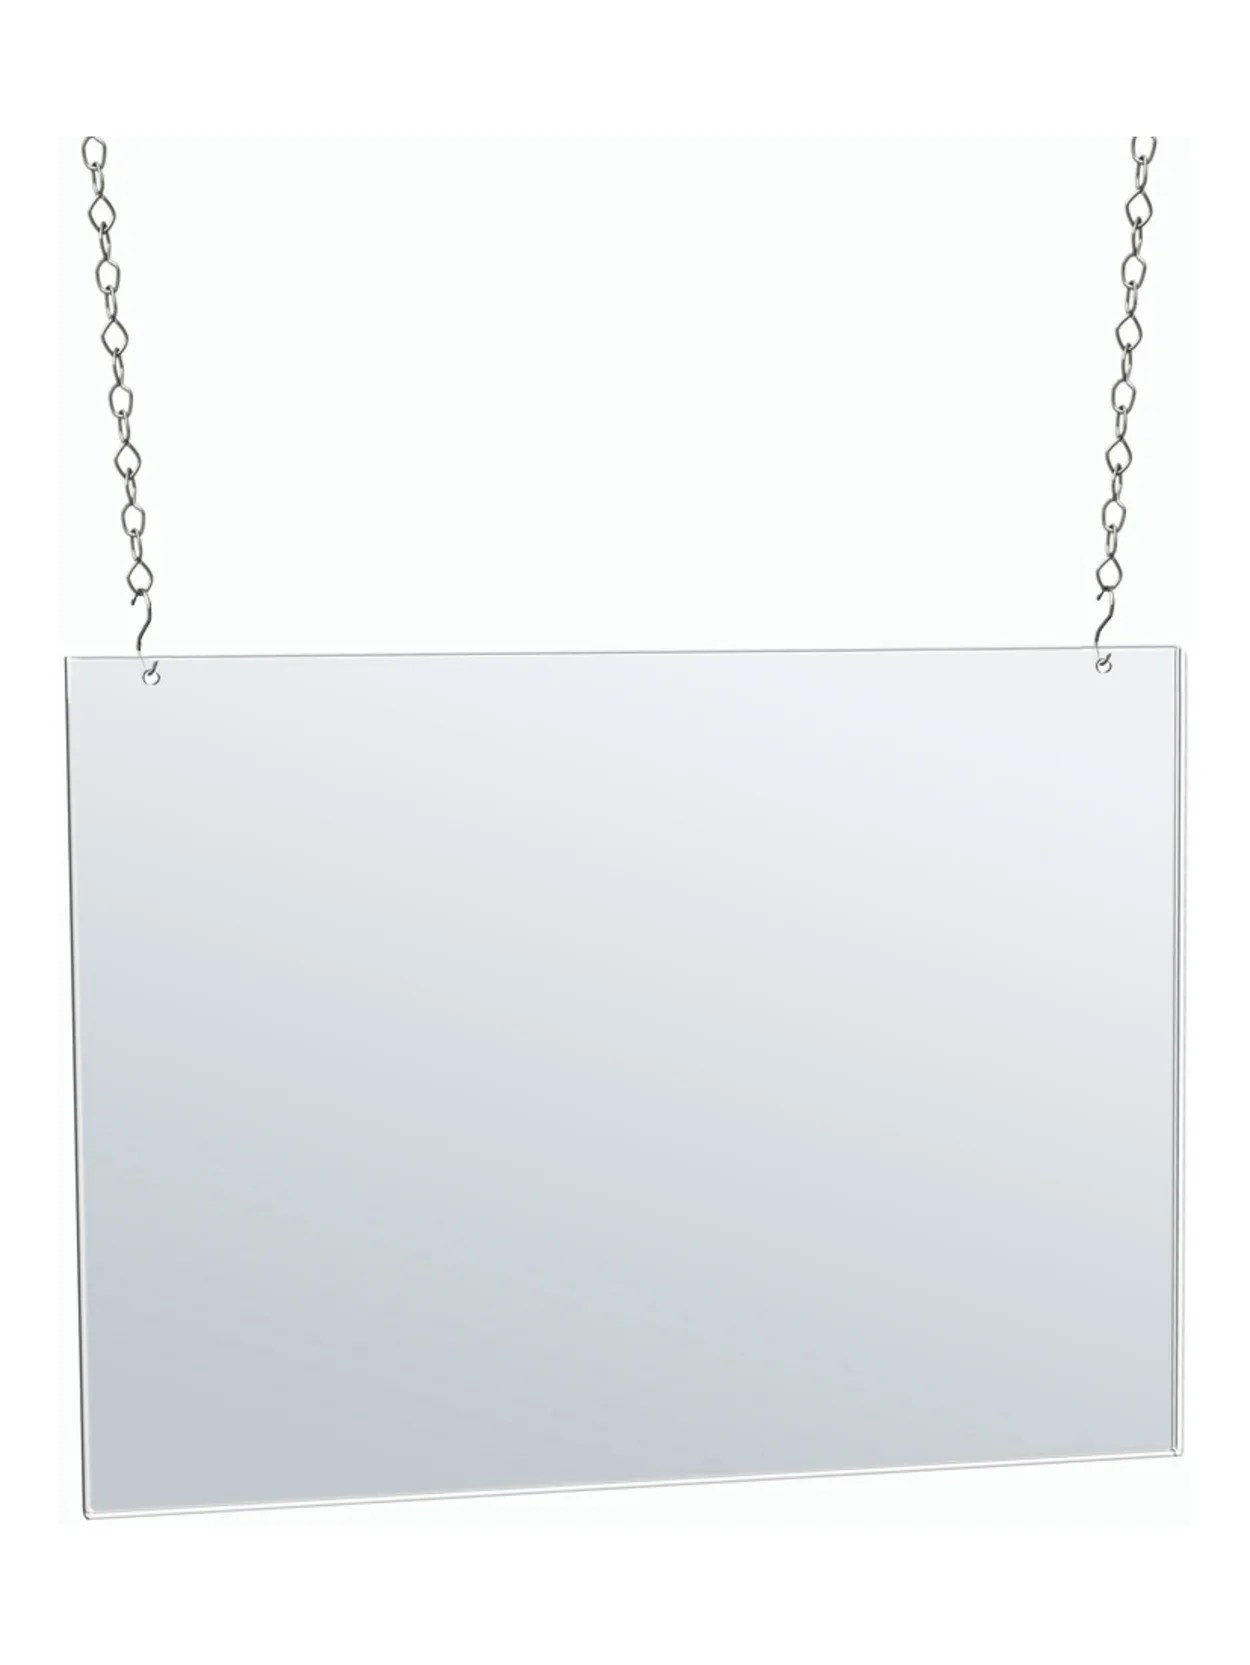 azar displays horizontal hanging poster frame 17 x 22 clear item 7695706